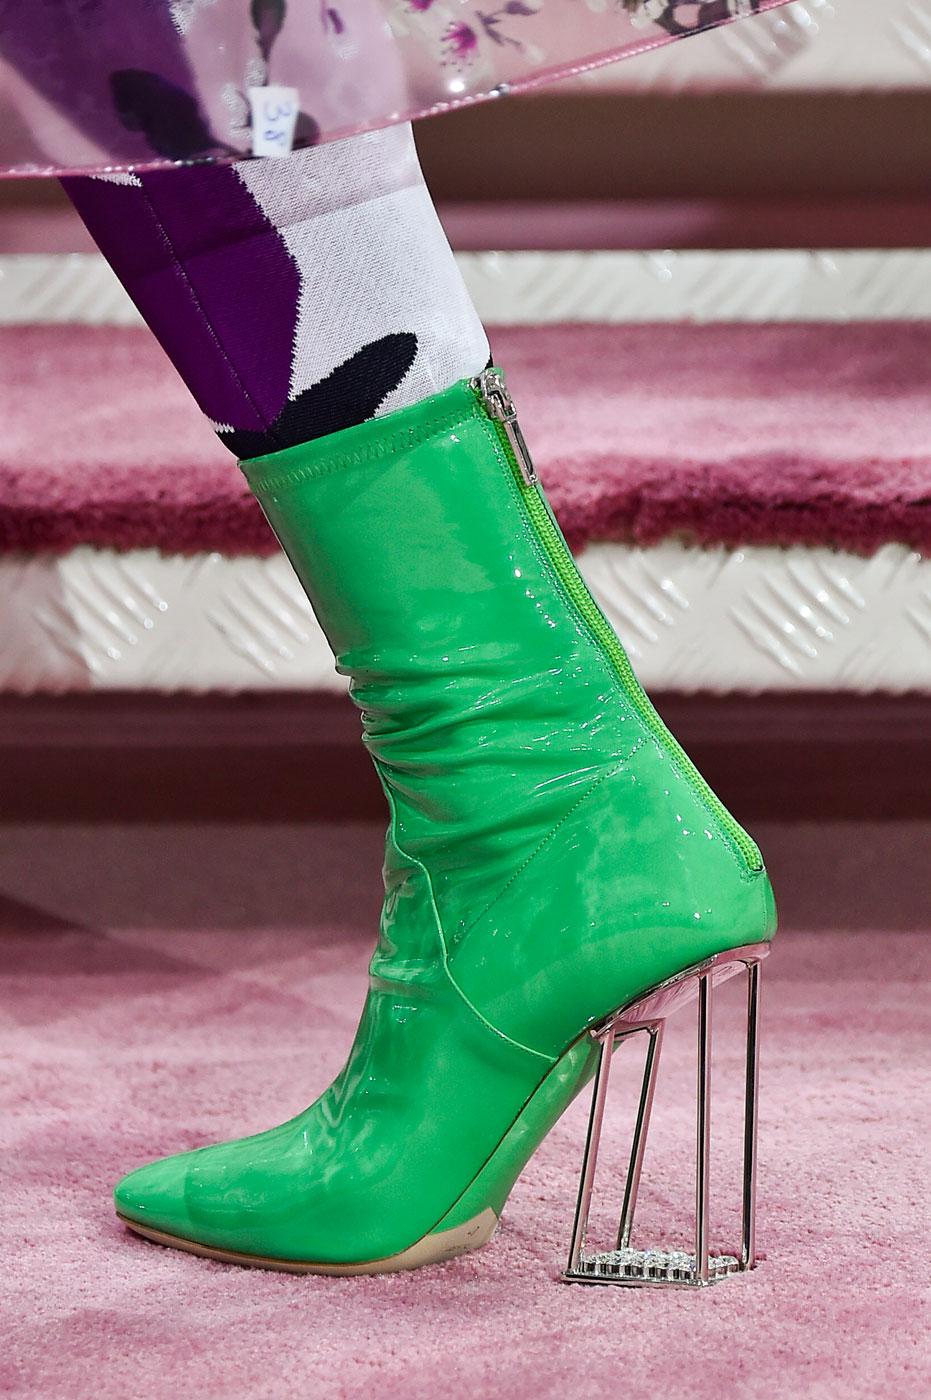 Christian-Dior-fashion-runway-show-close-ups-haute-couture-paris-spring-summer-2015-the-impression-104